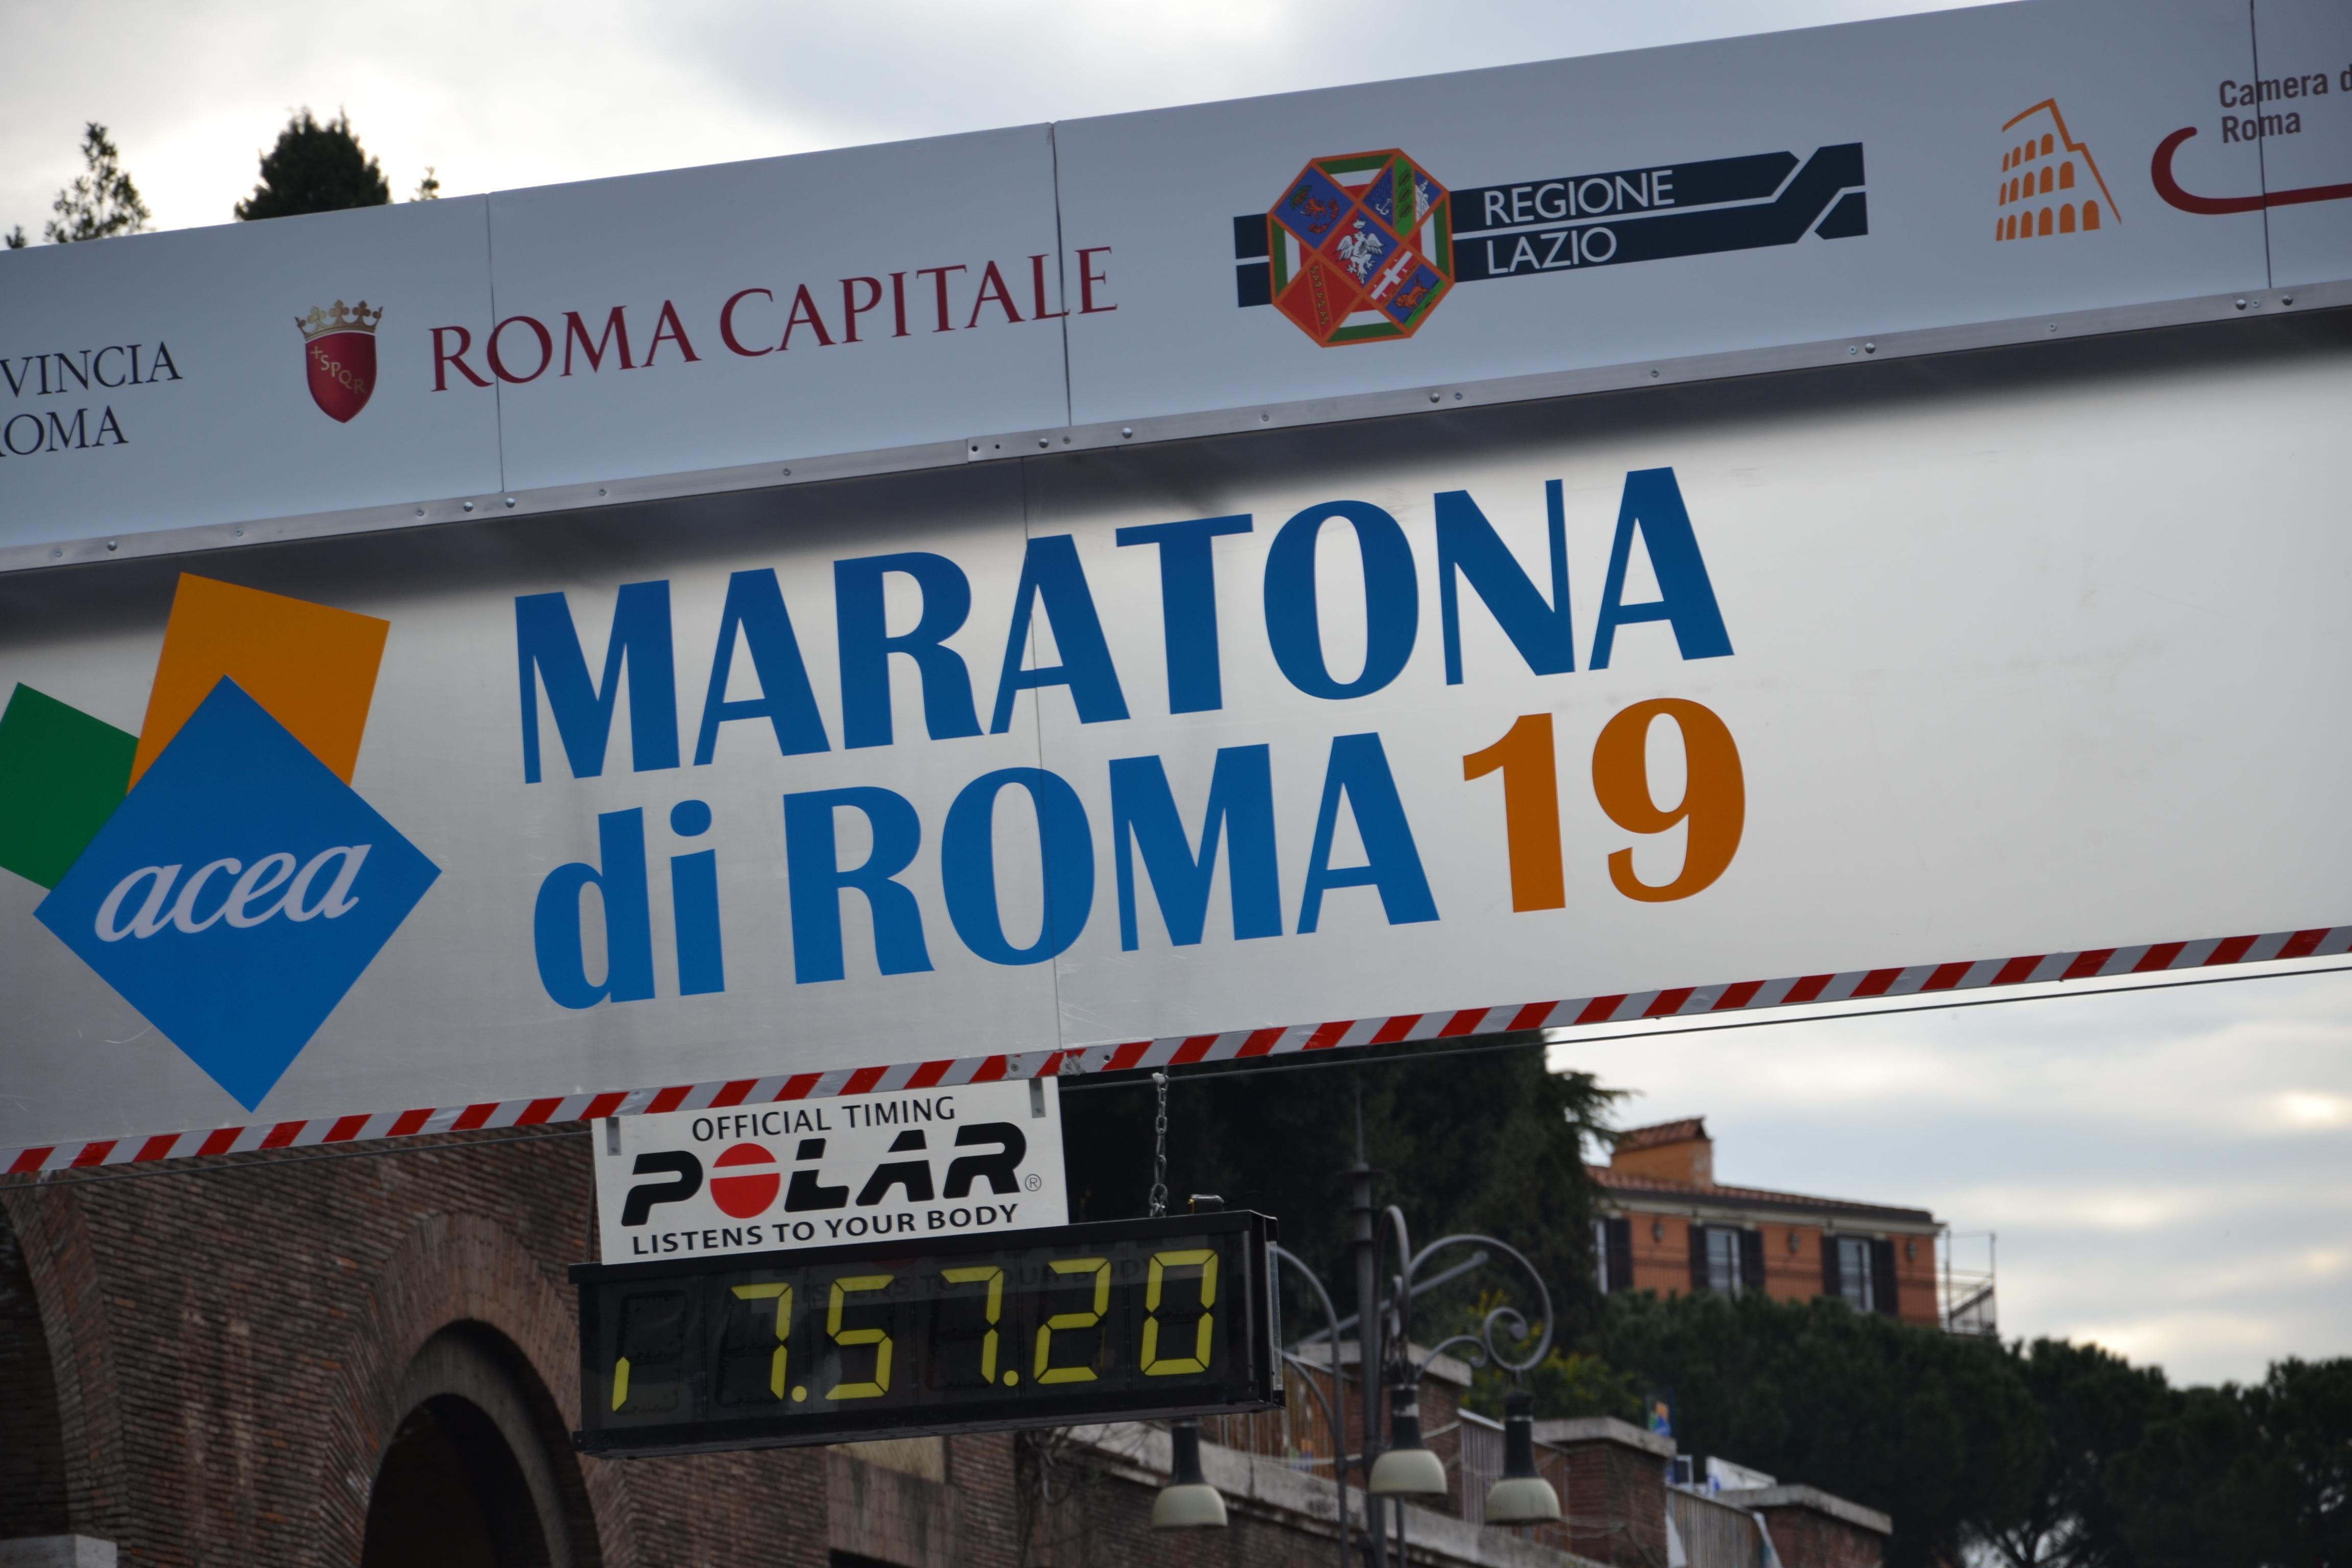 maratona-di-roma-2013-018